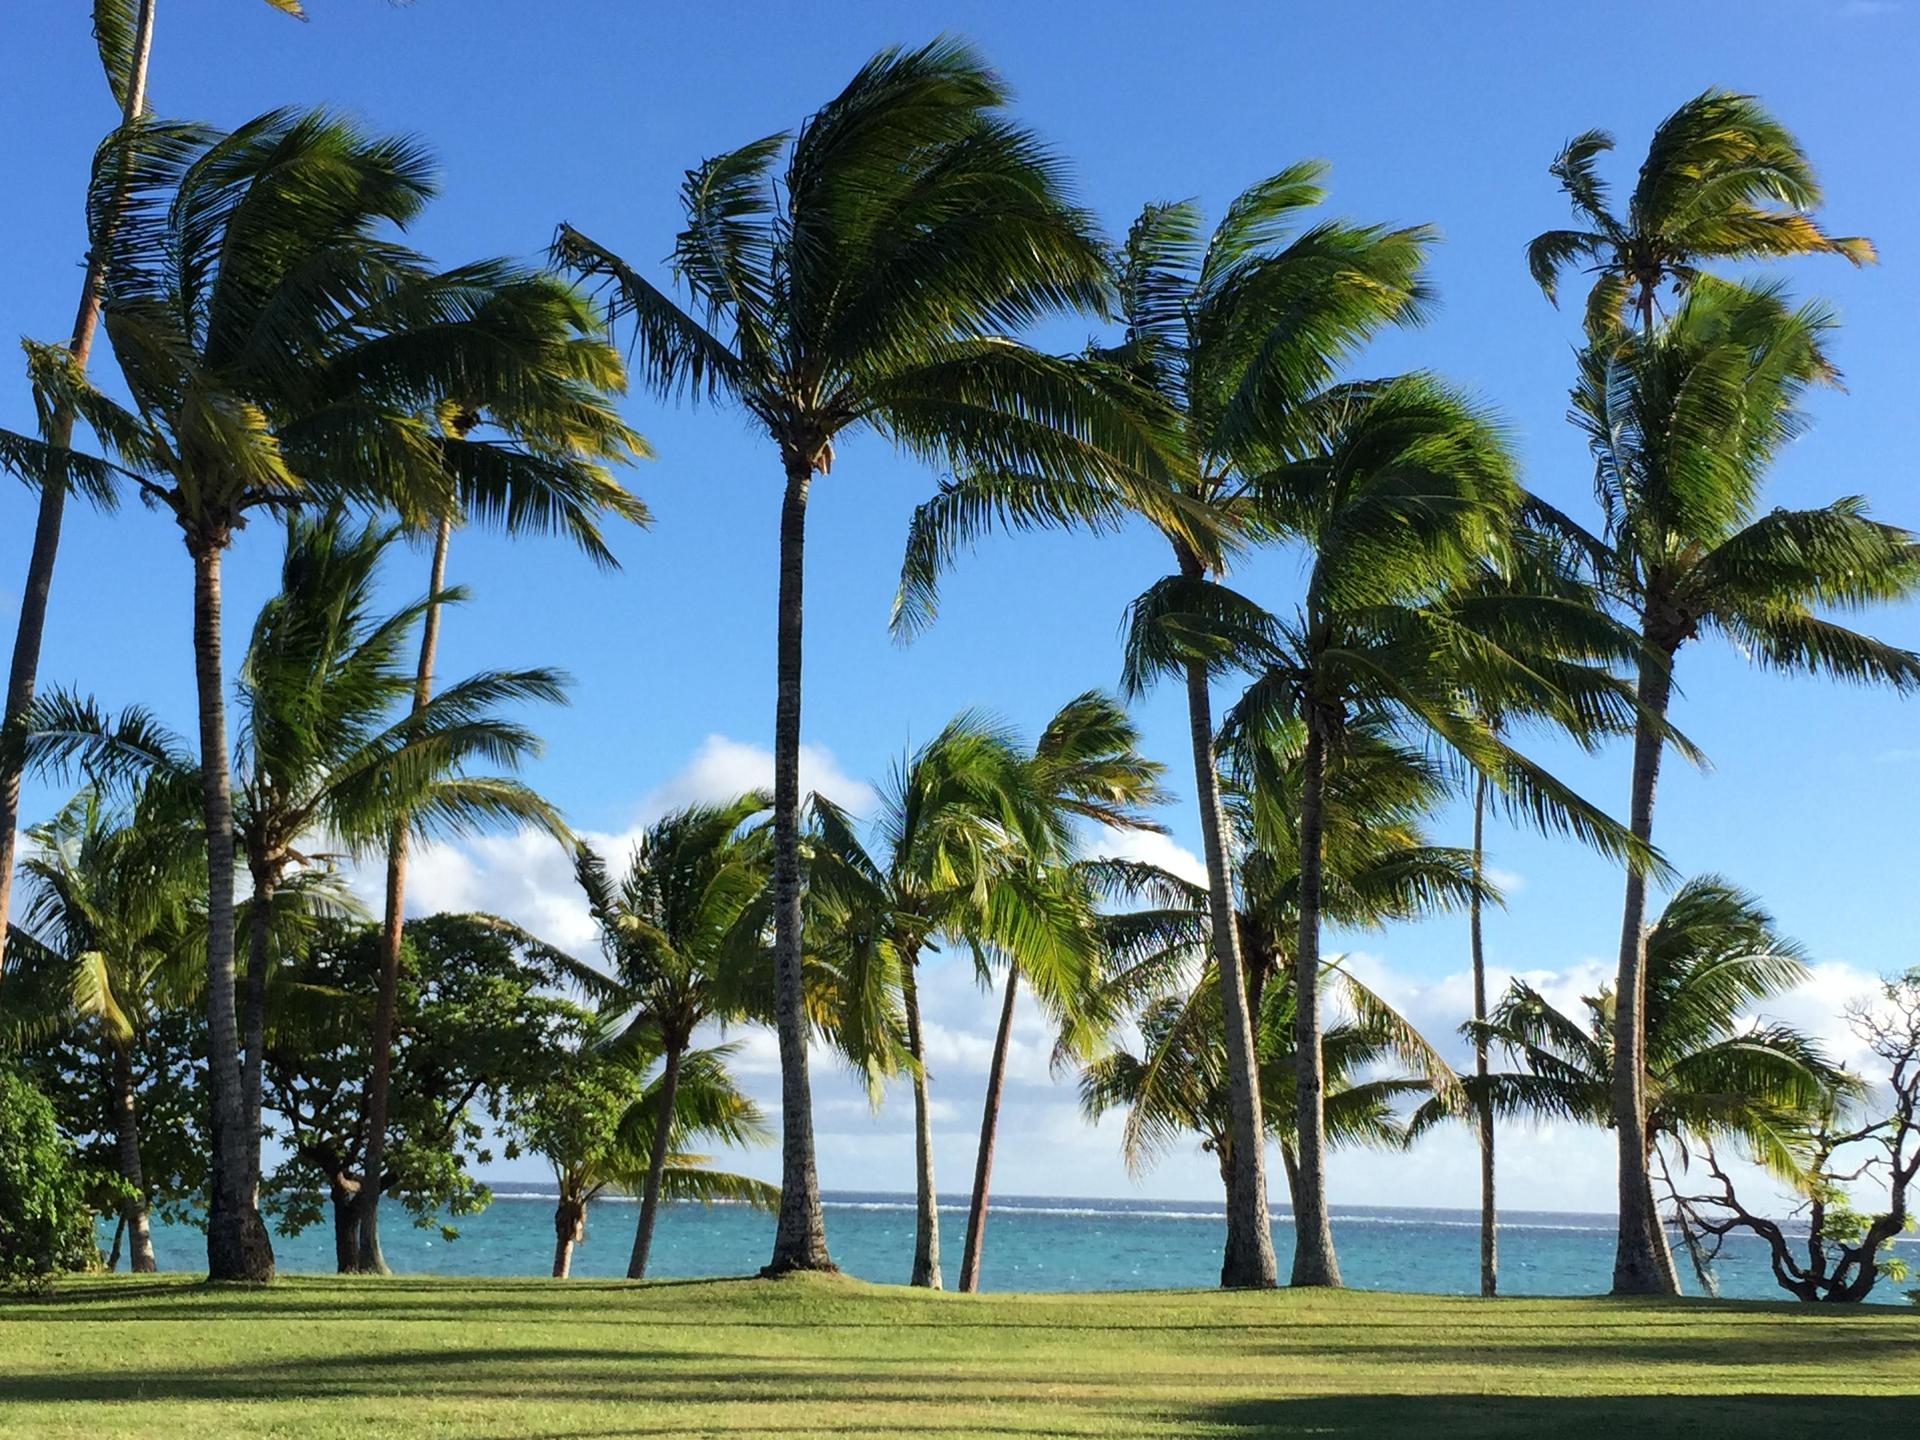 The Island of Fiji